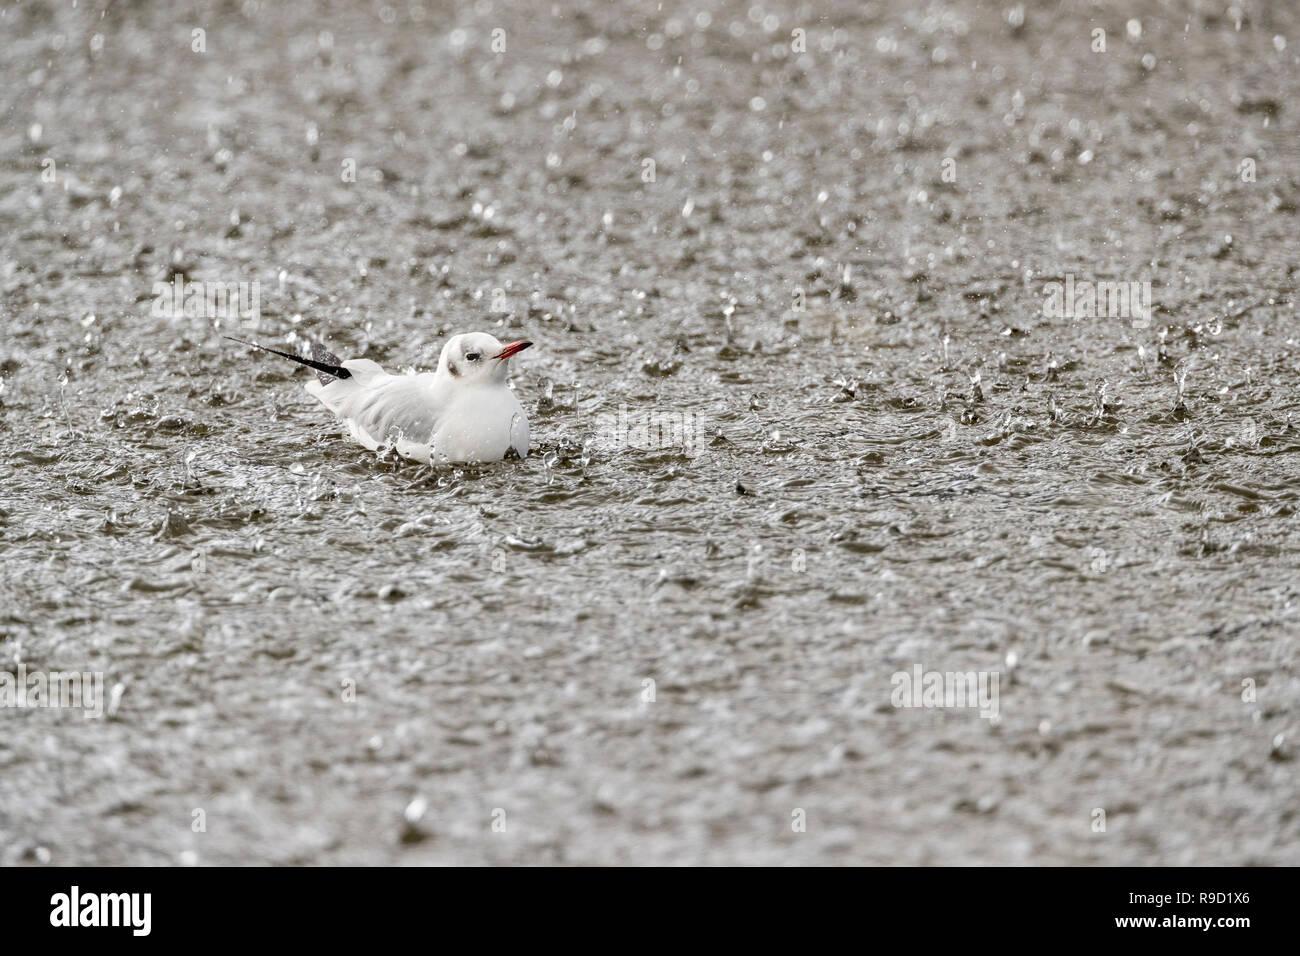 Black Headed Gull; Chroicocephalus ridibundus; in Hail Storm; Cornwall; UK - Stock Image